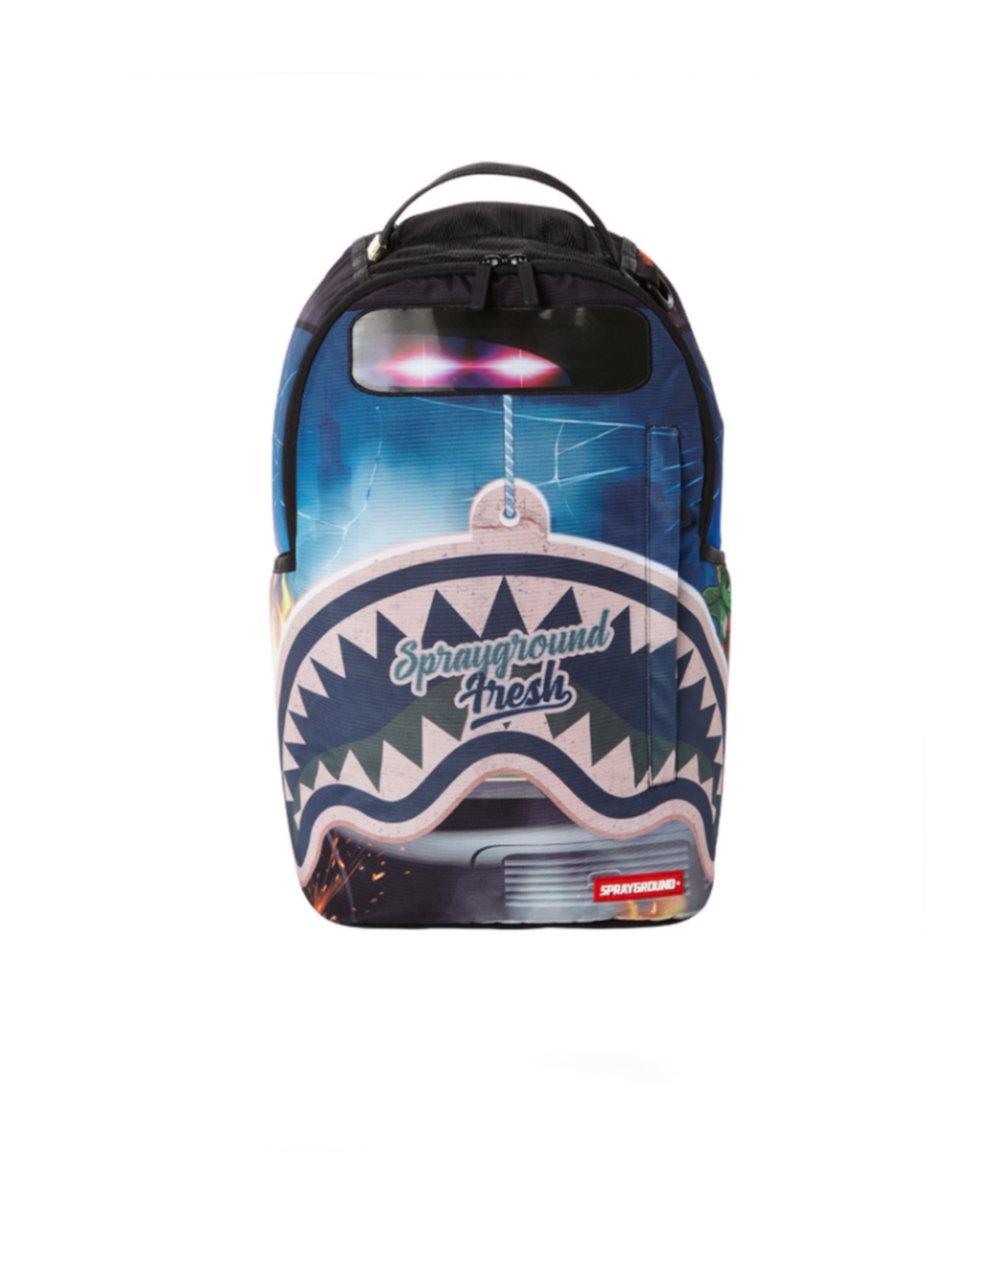 Sprayground Grand Theft Auto Shark Backpack (B2770)